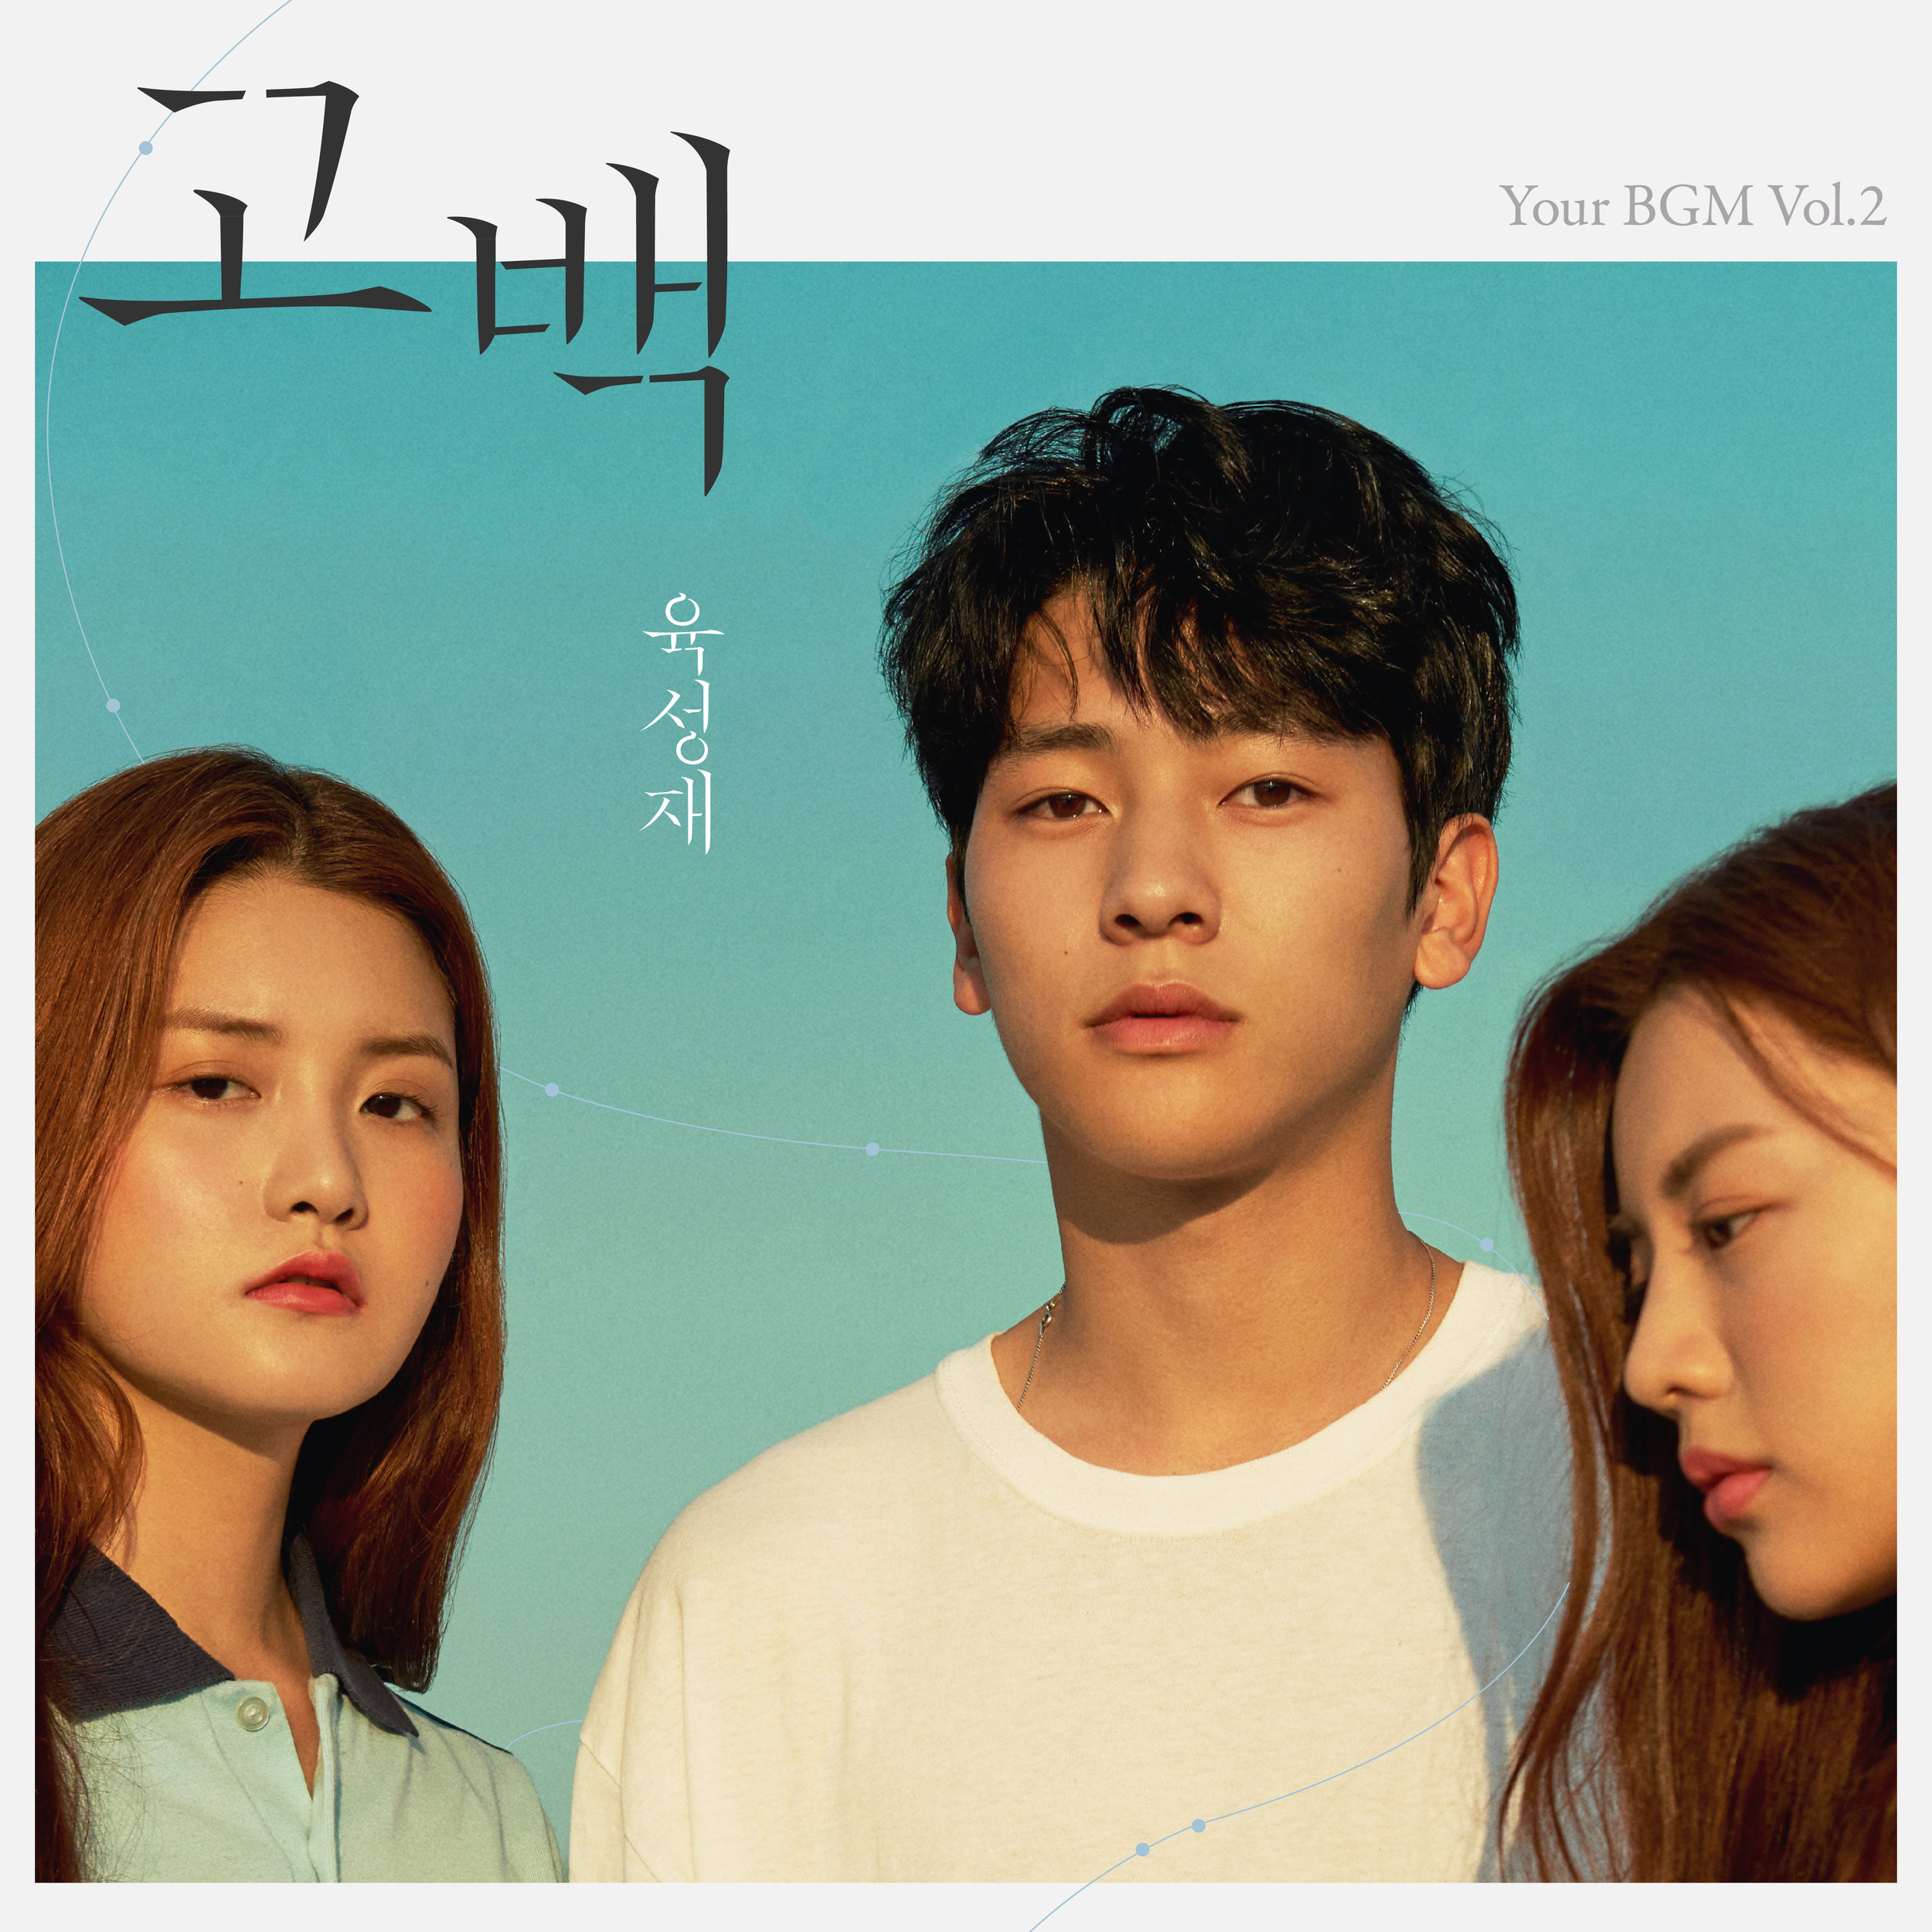 [Your BGM Vol.2] 육성재(BTOB)-고백(Confession)